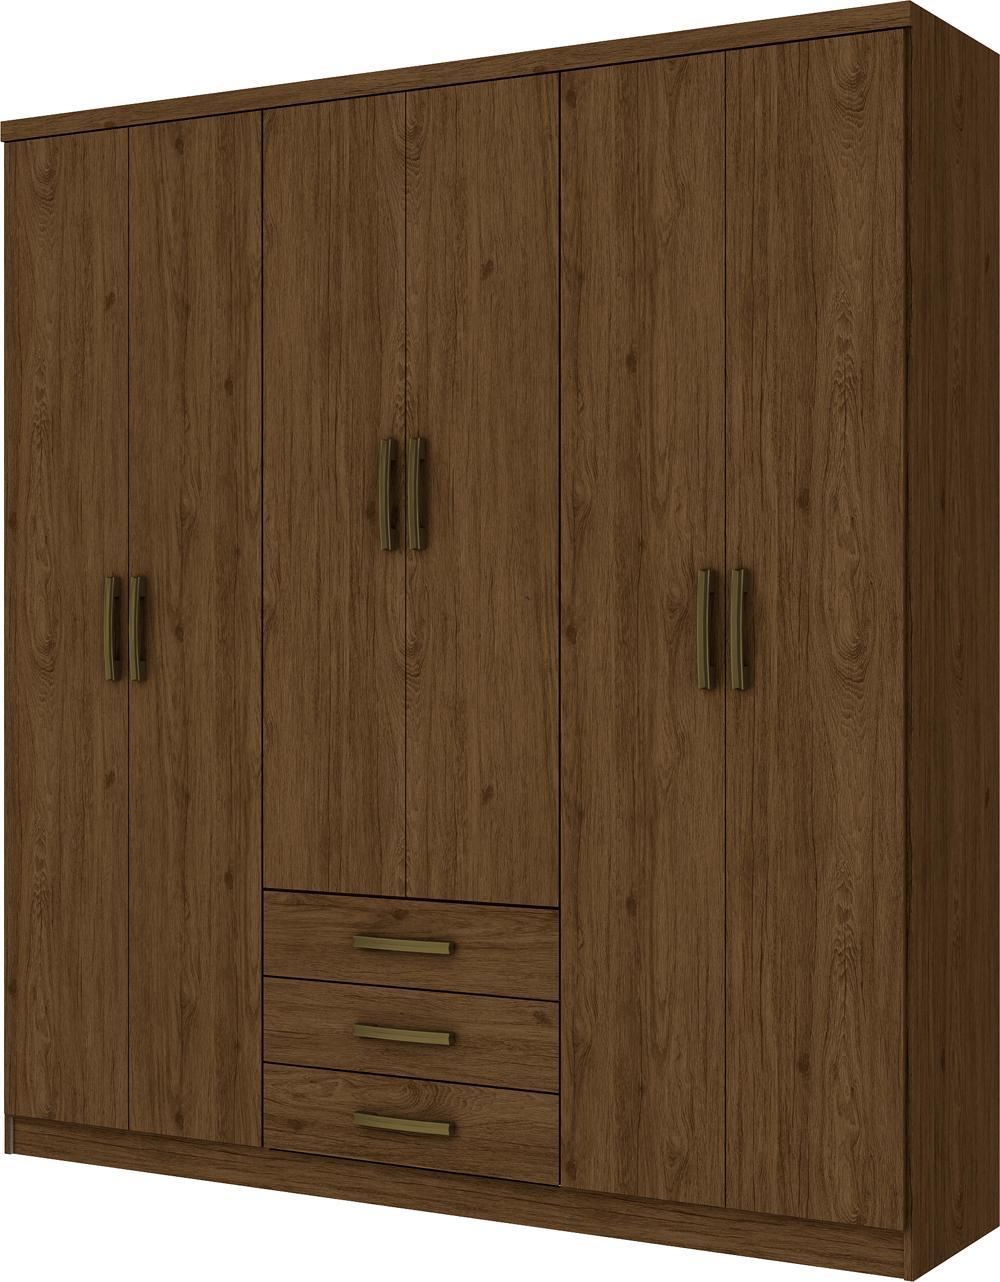 Guarda Roupa Caju 6 Portas Castanho HP - Henn